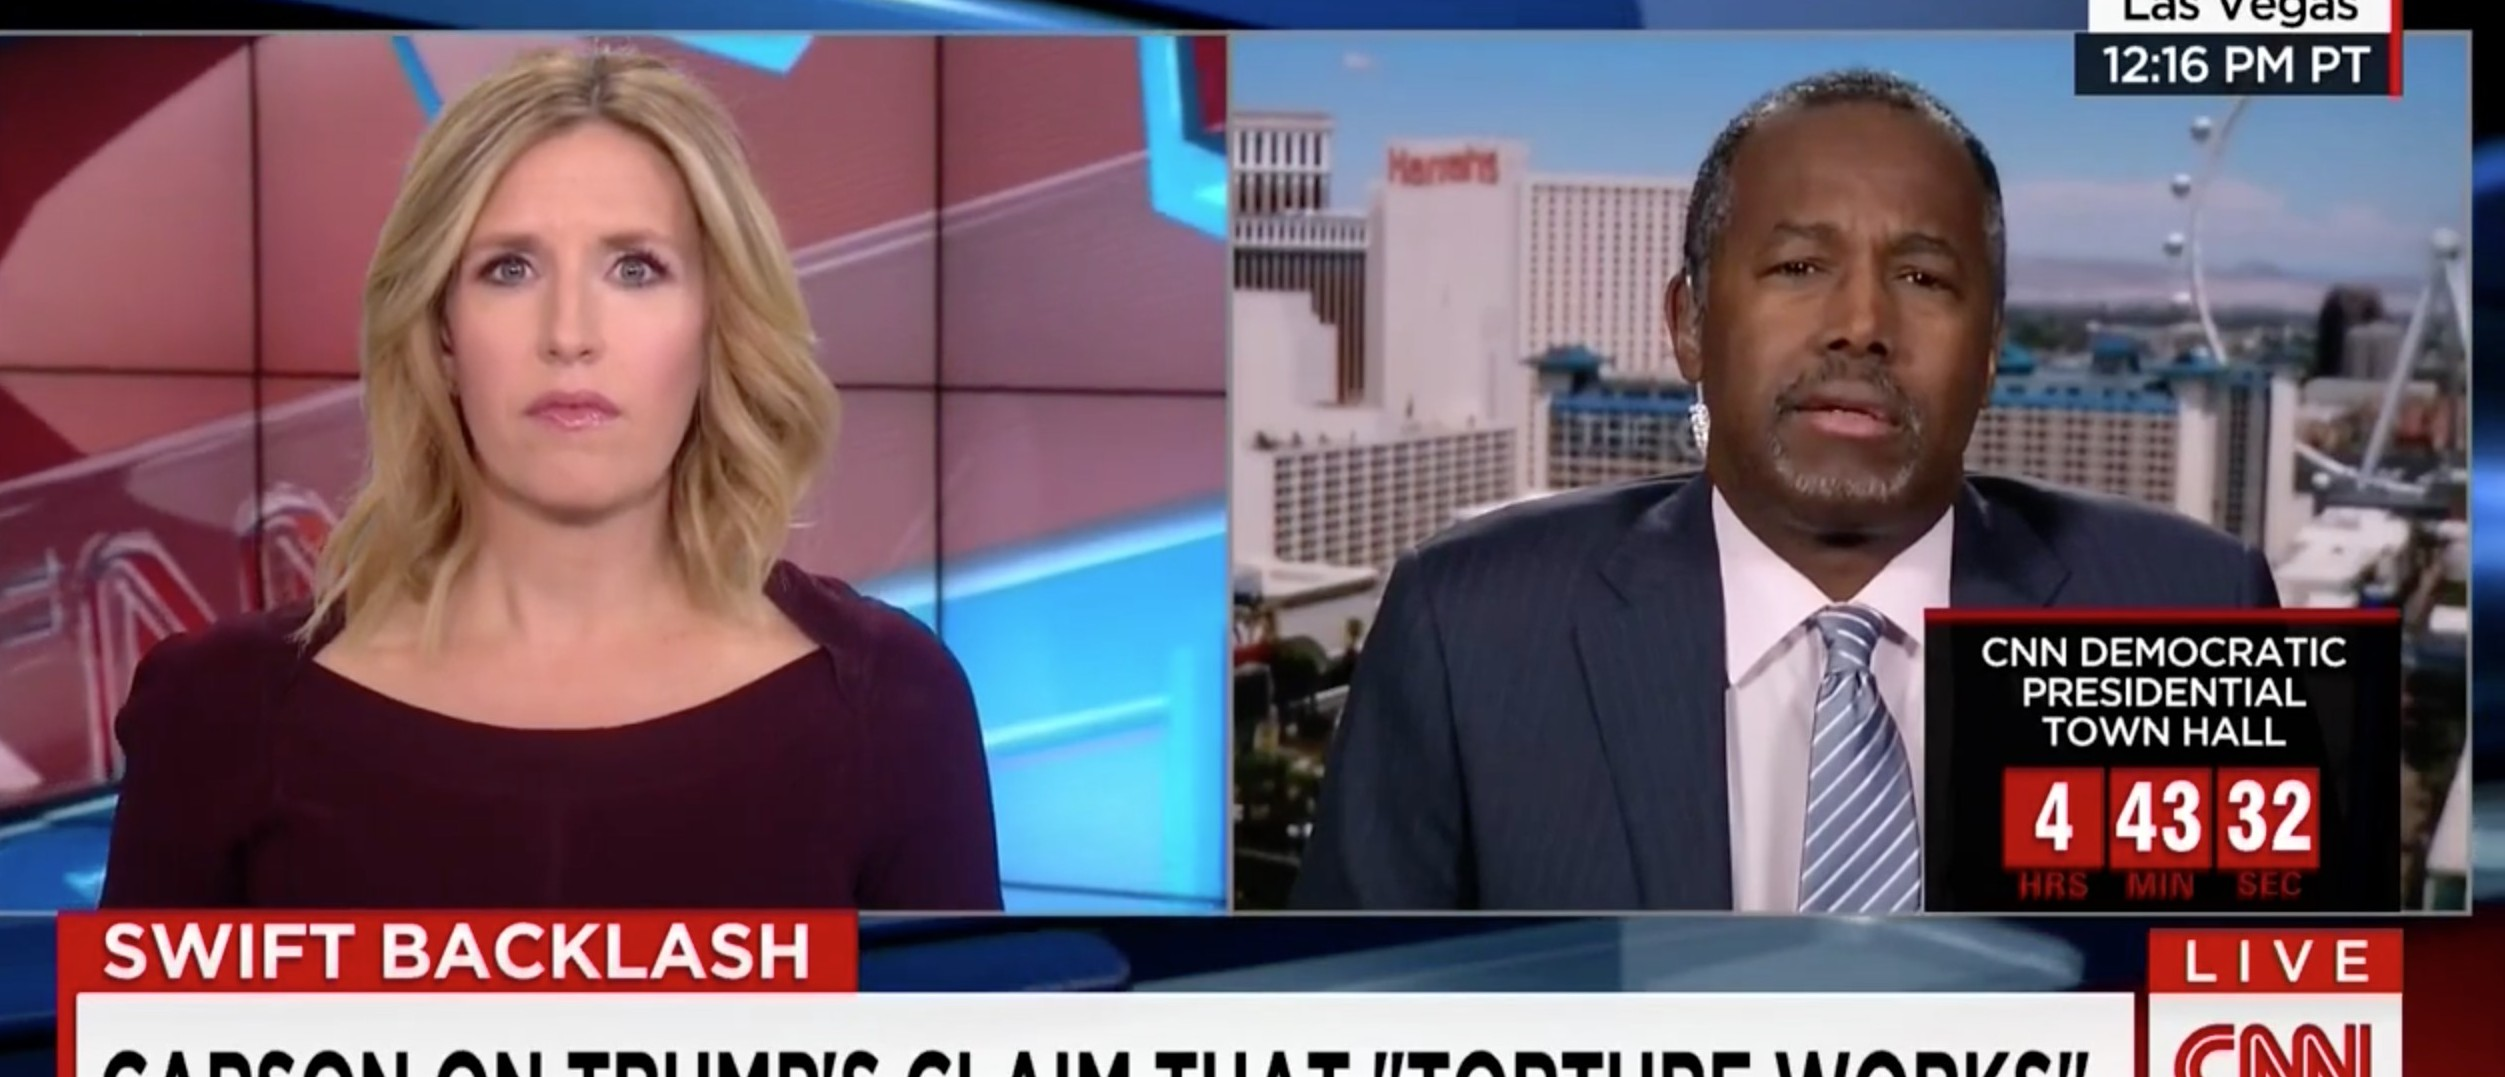 Ben Carson, Screen shot CNN, 2-23-2016